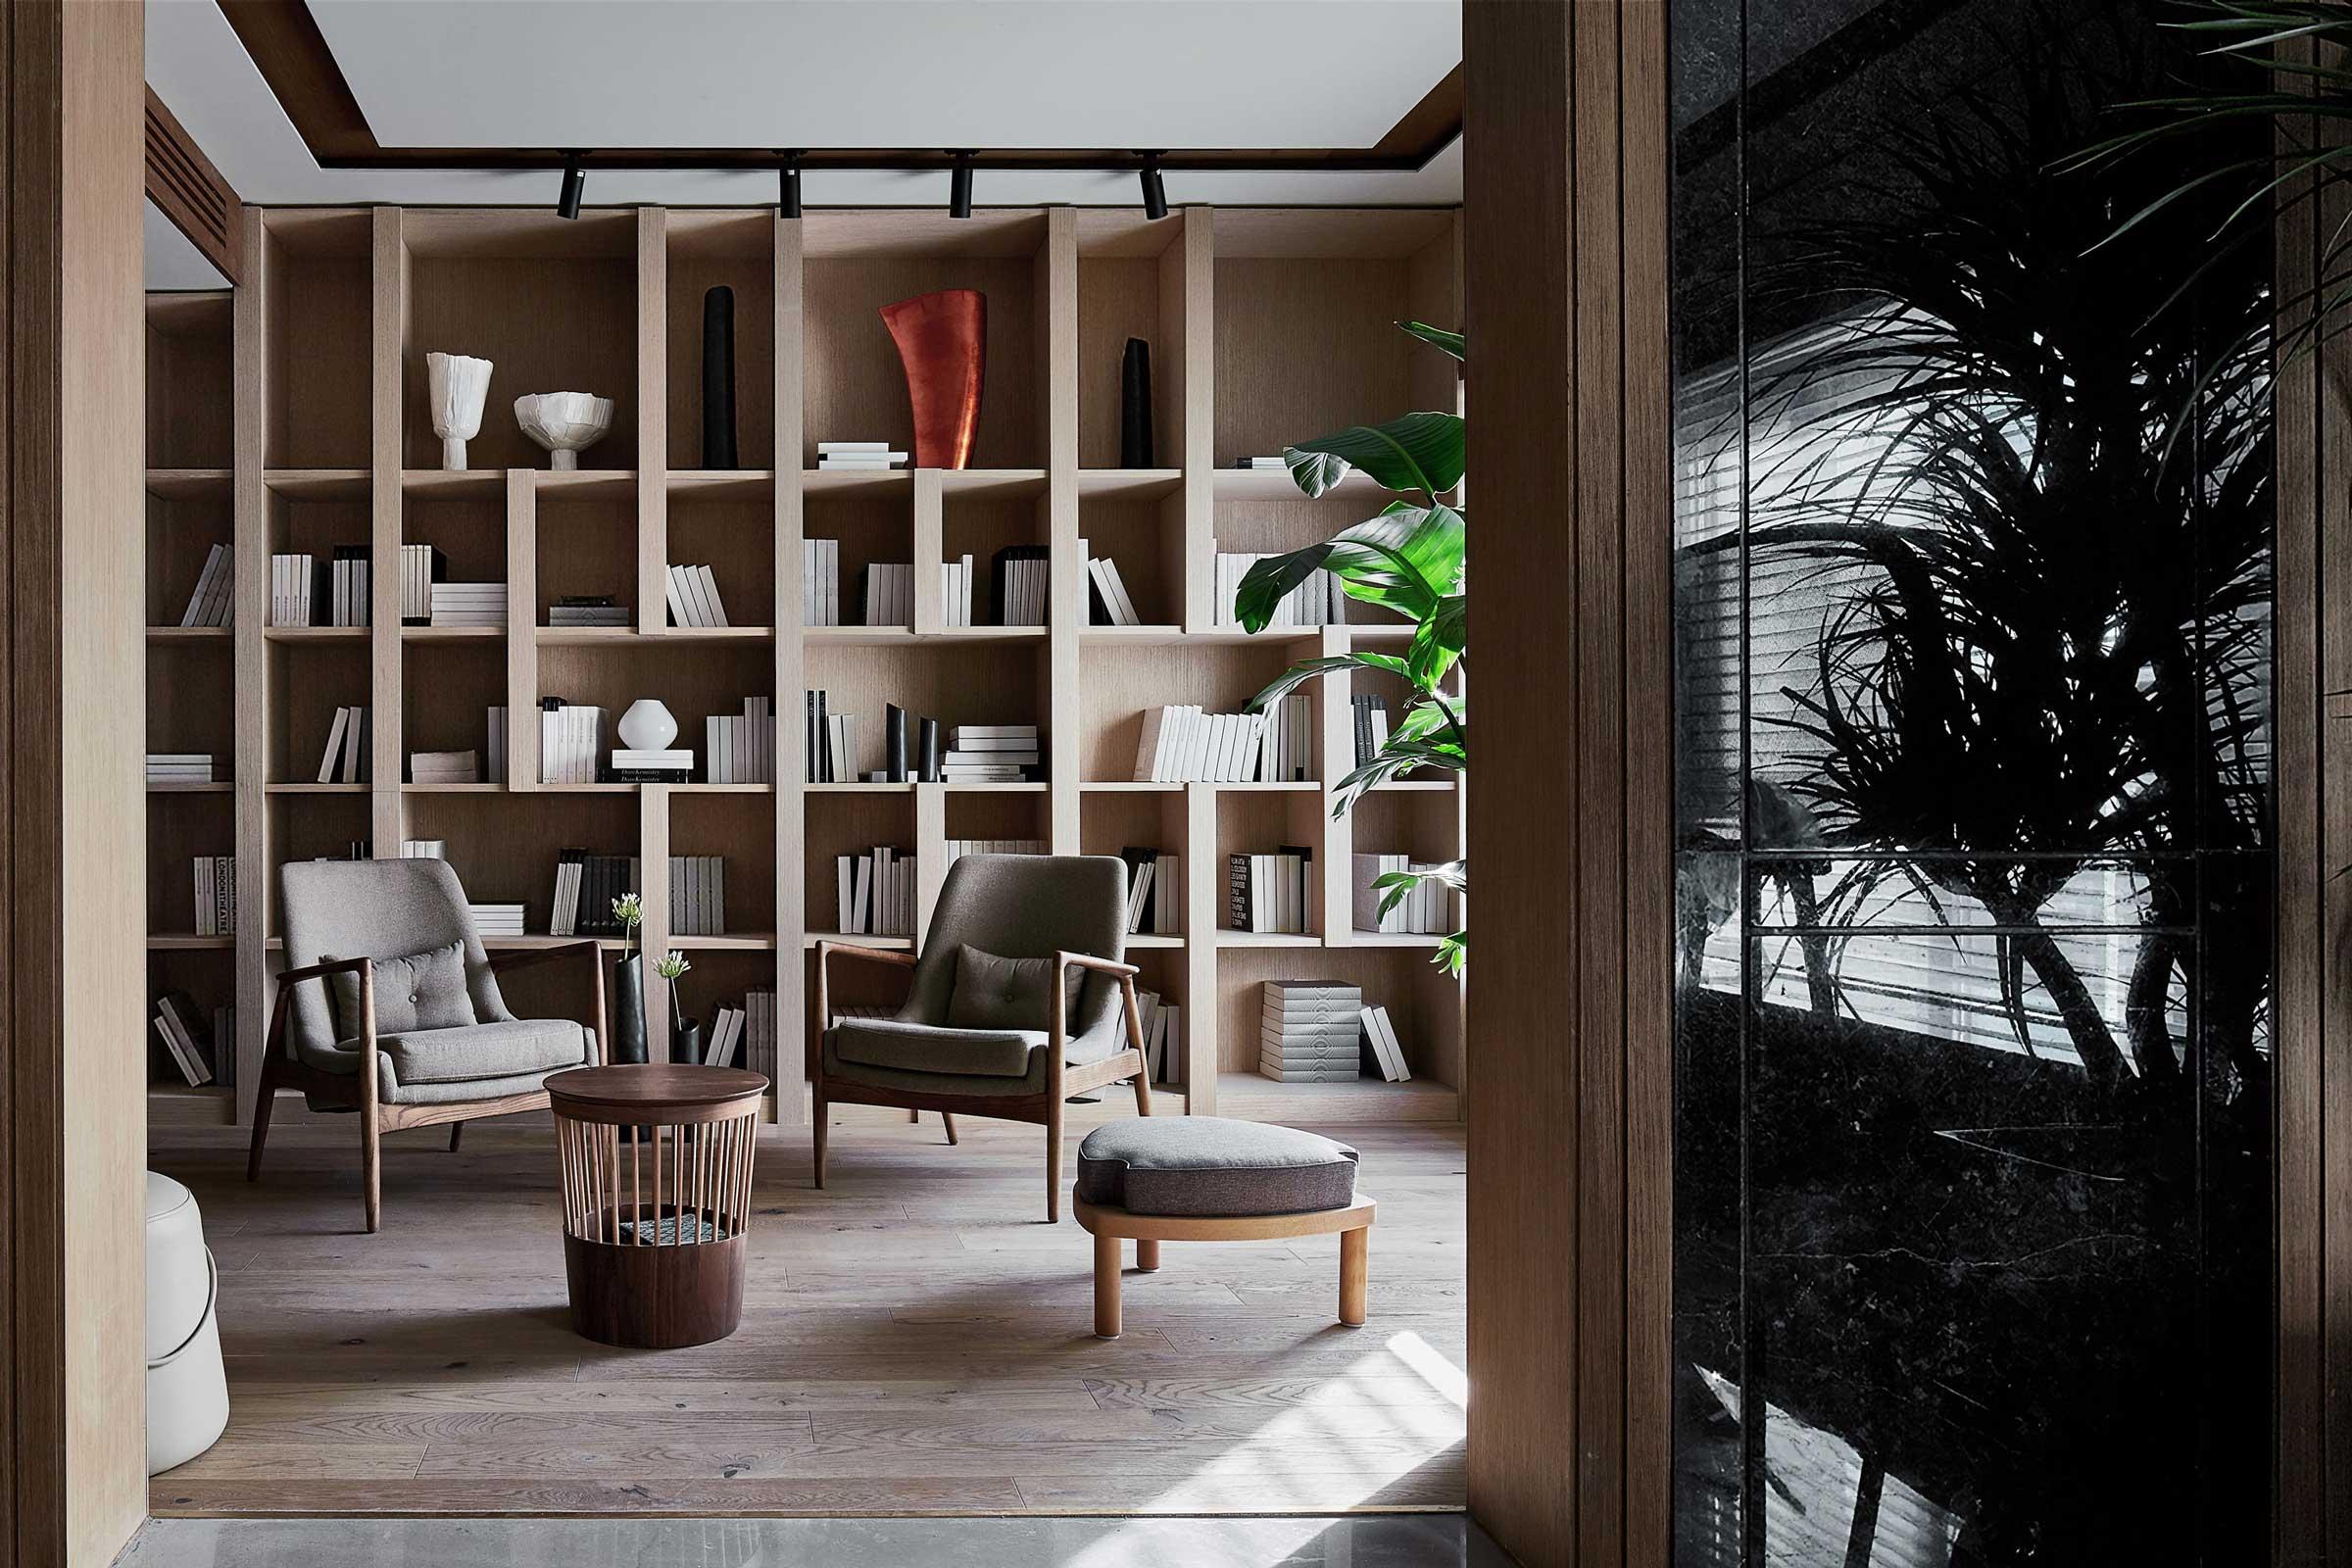 lane-house-ARCHISTRY-nolan-chao-03-study-room.jpg